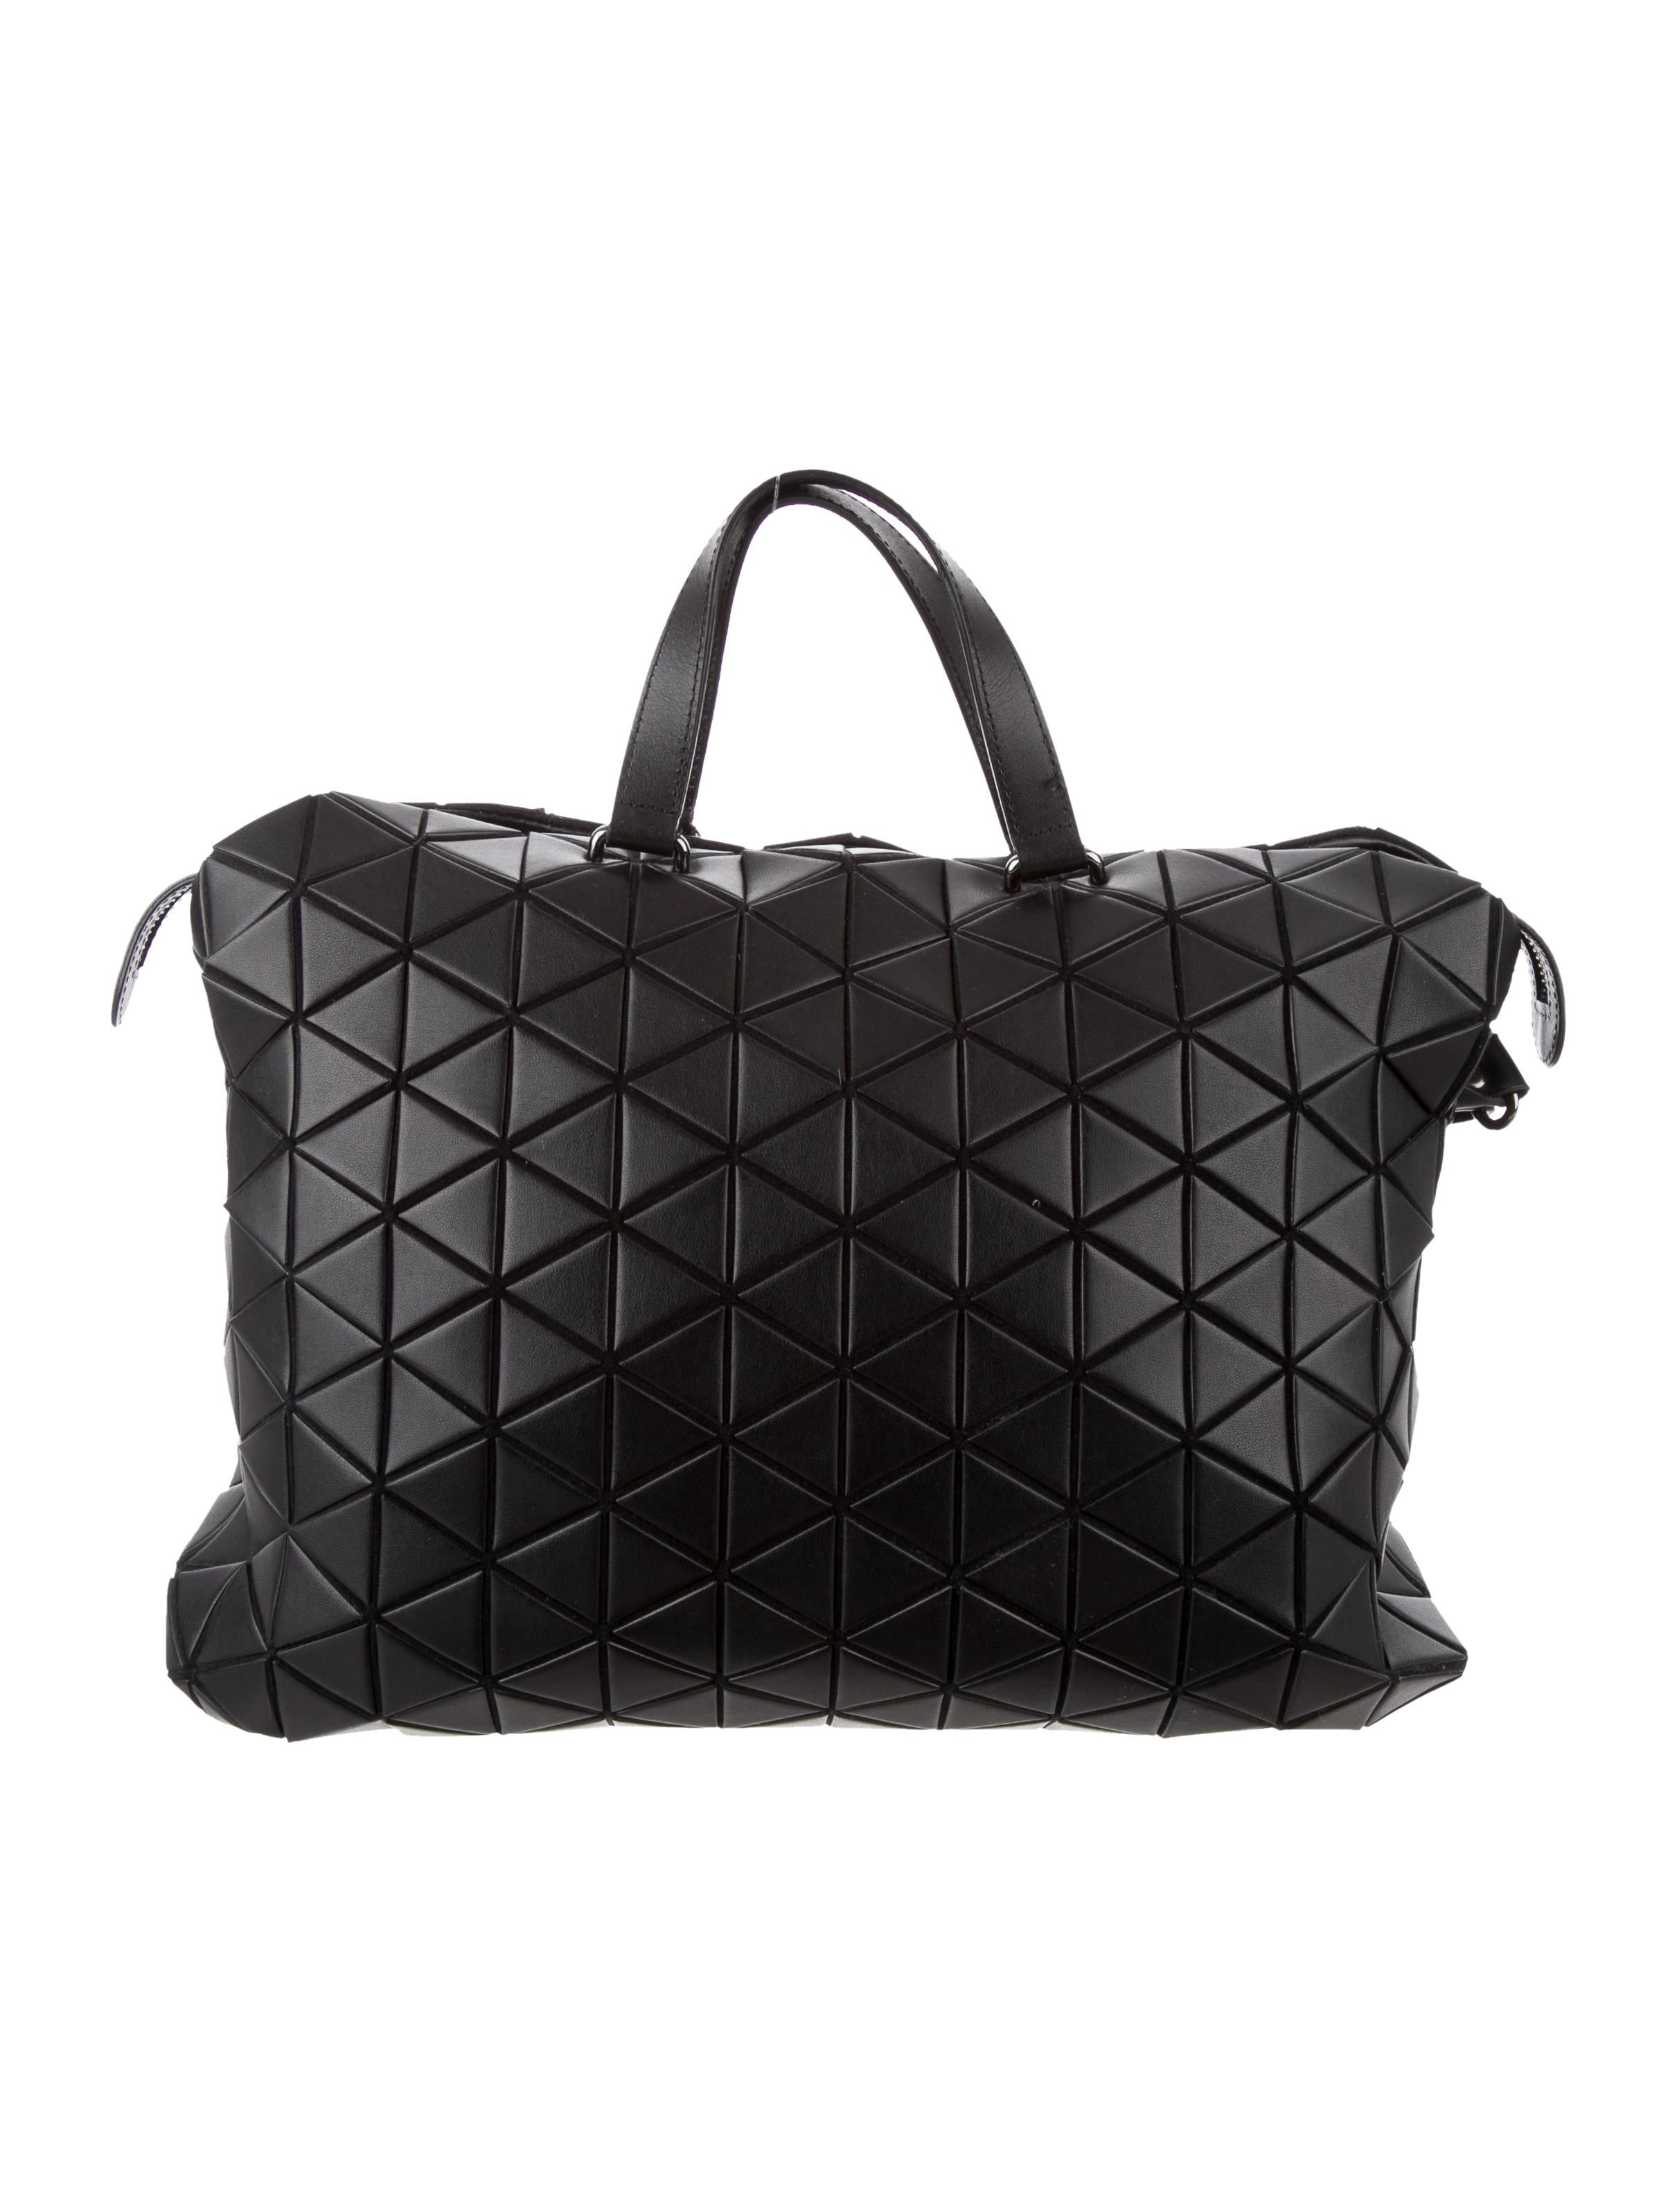 d0c722b97a Bao Bao Issey Miyake Tonneau Matte Boston Bag - Handbags ...